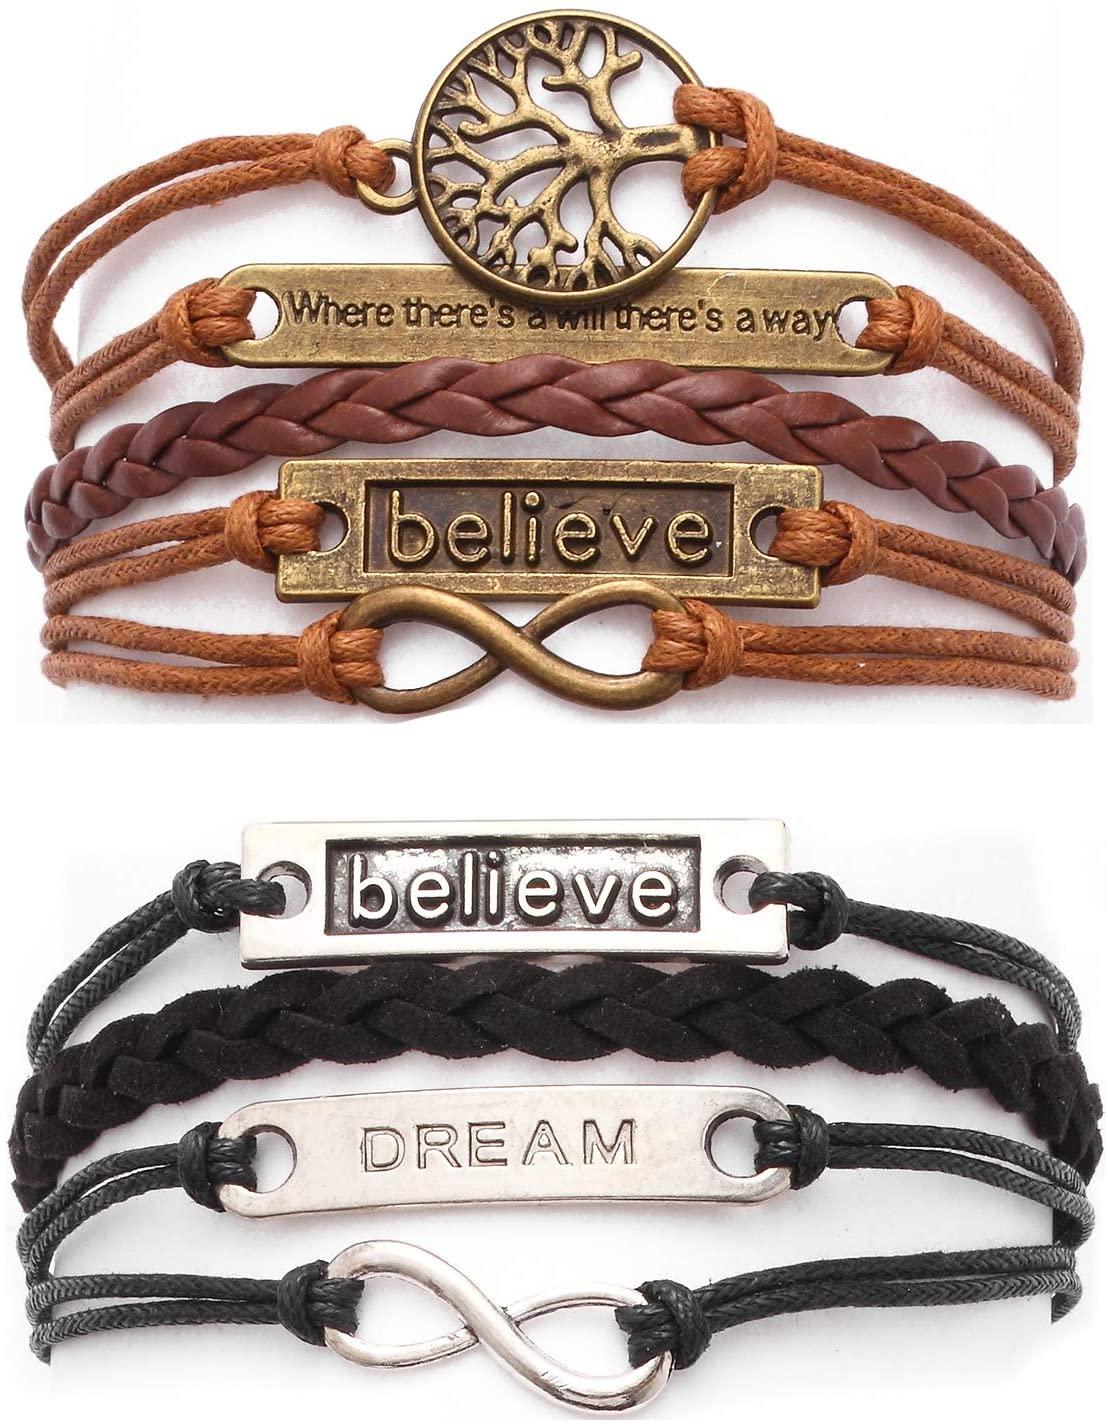 Fpxnb 2 Pack Handmade Bracelets, Leather Wrap Accessories on Wrist, Angel Wings Love Faith Owl Motto Tree Bird Tortoise Cloud Dream Believe (Set of 2)